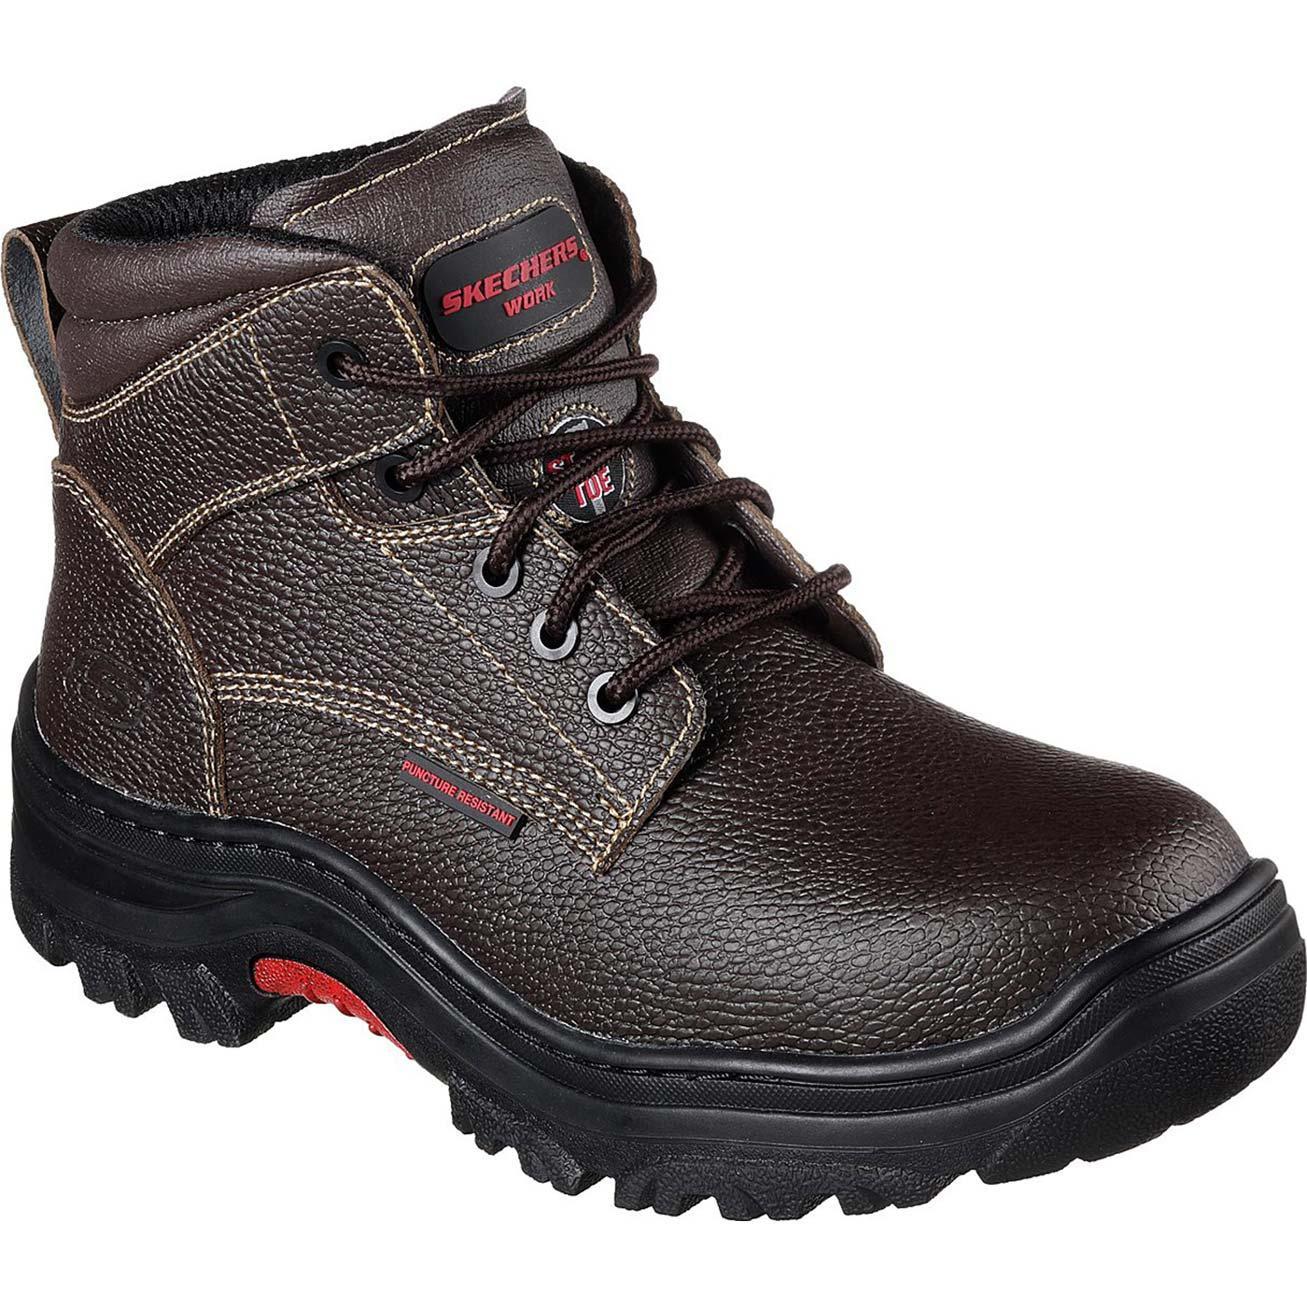 Skechers Steel Toe Puncture Resistance Work Boot 77143brn